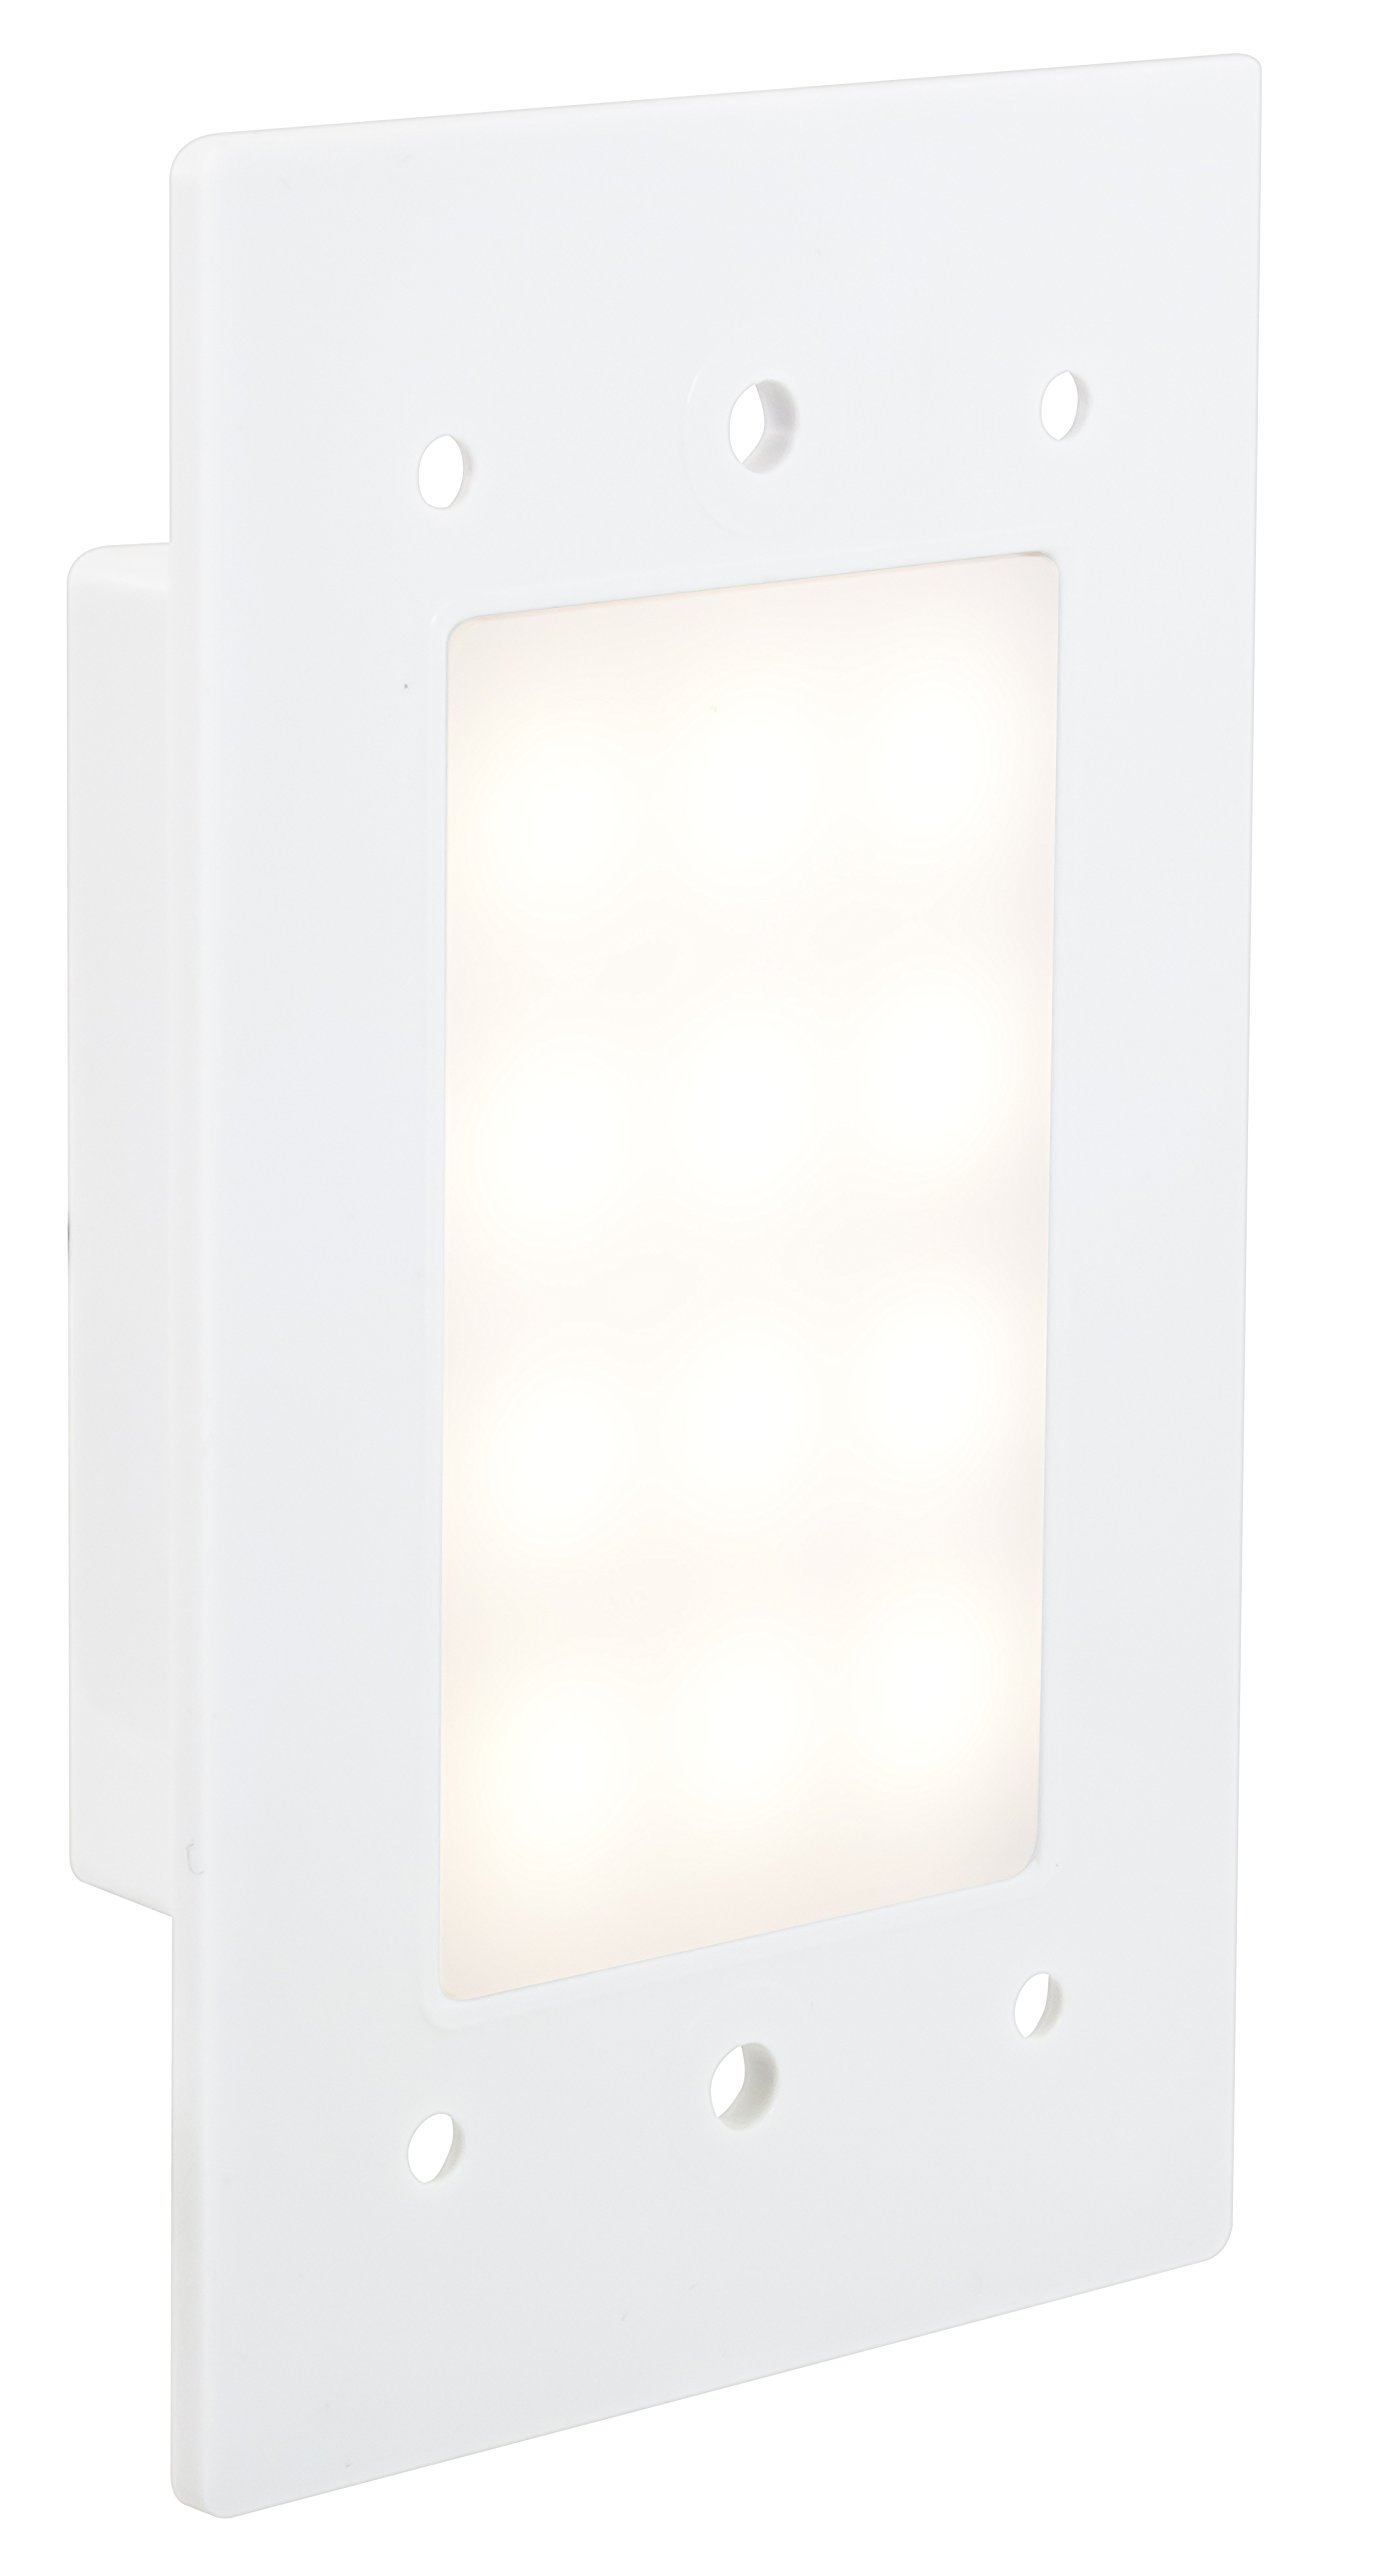 American Lighting LED 100-277V Indoor/Outdoor Step Light, 1.7 Watts, 3000K Warm White